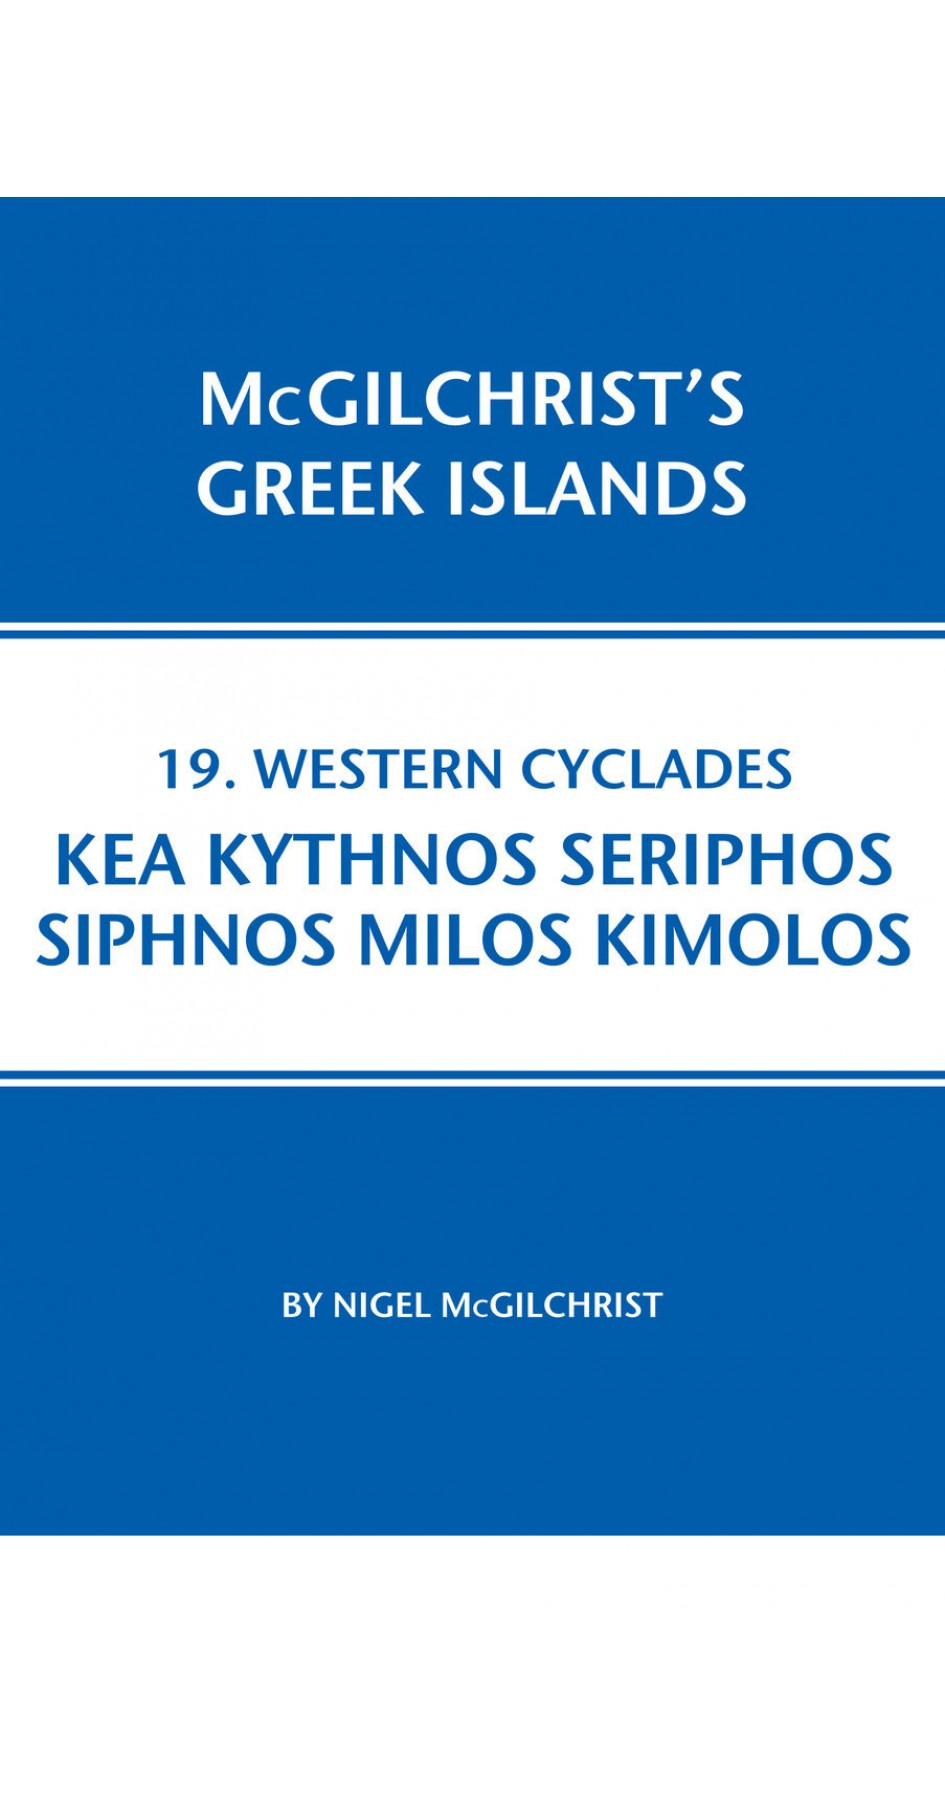 19. Western Cyclades: Kea, Kythnos, Seriphos, Siphnos, Milos, Kimolos - McGilchrist's Greek Islands